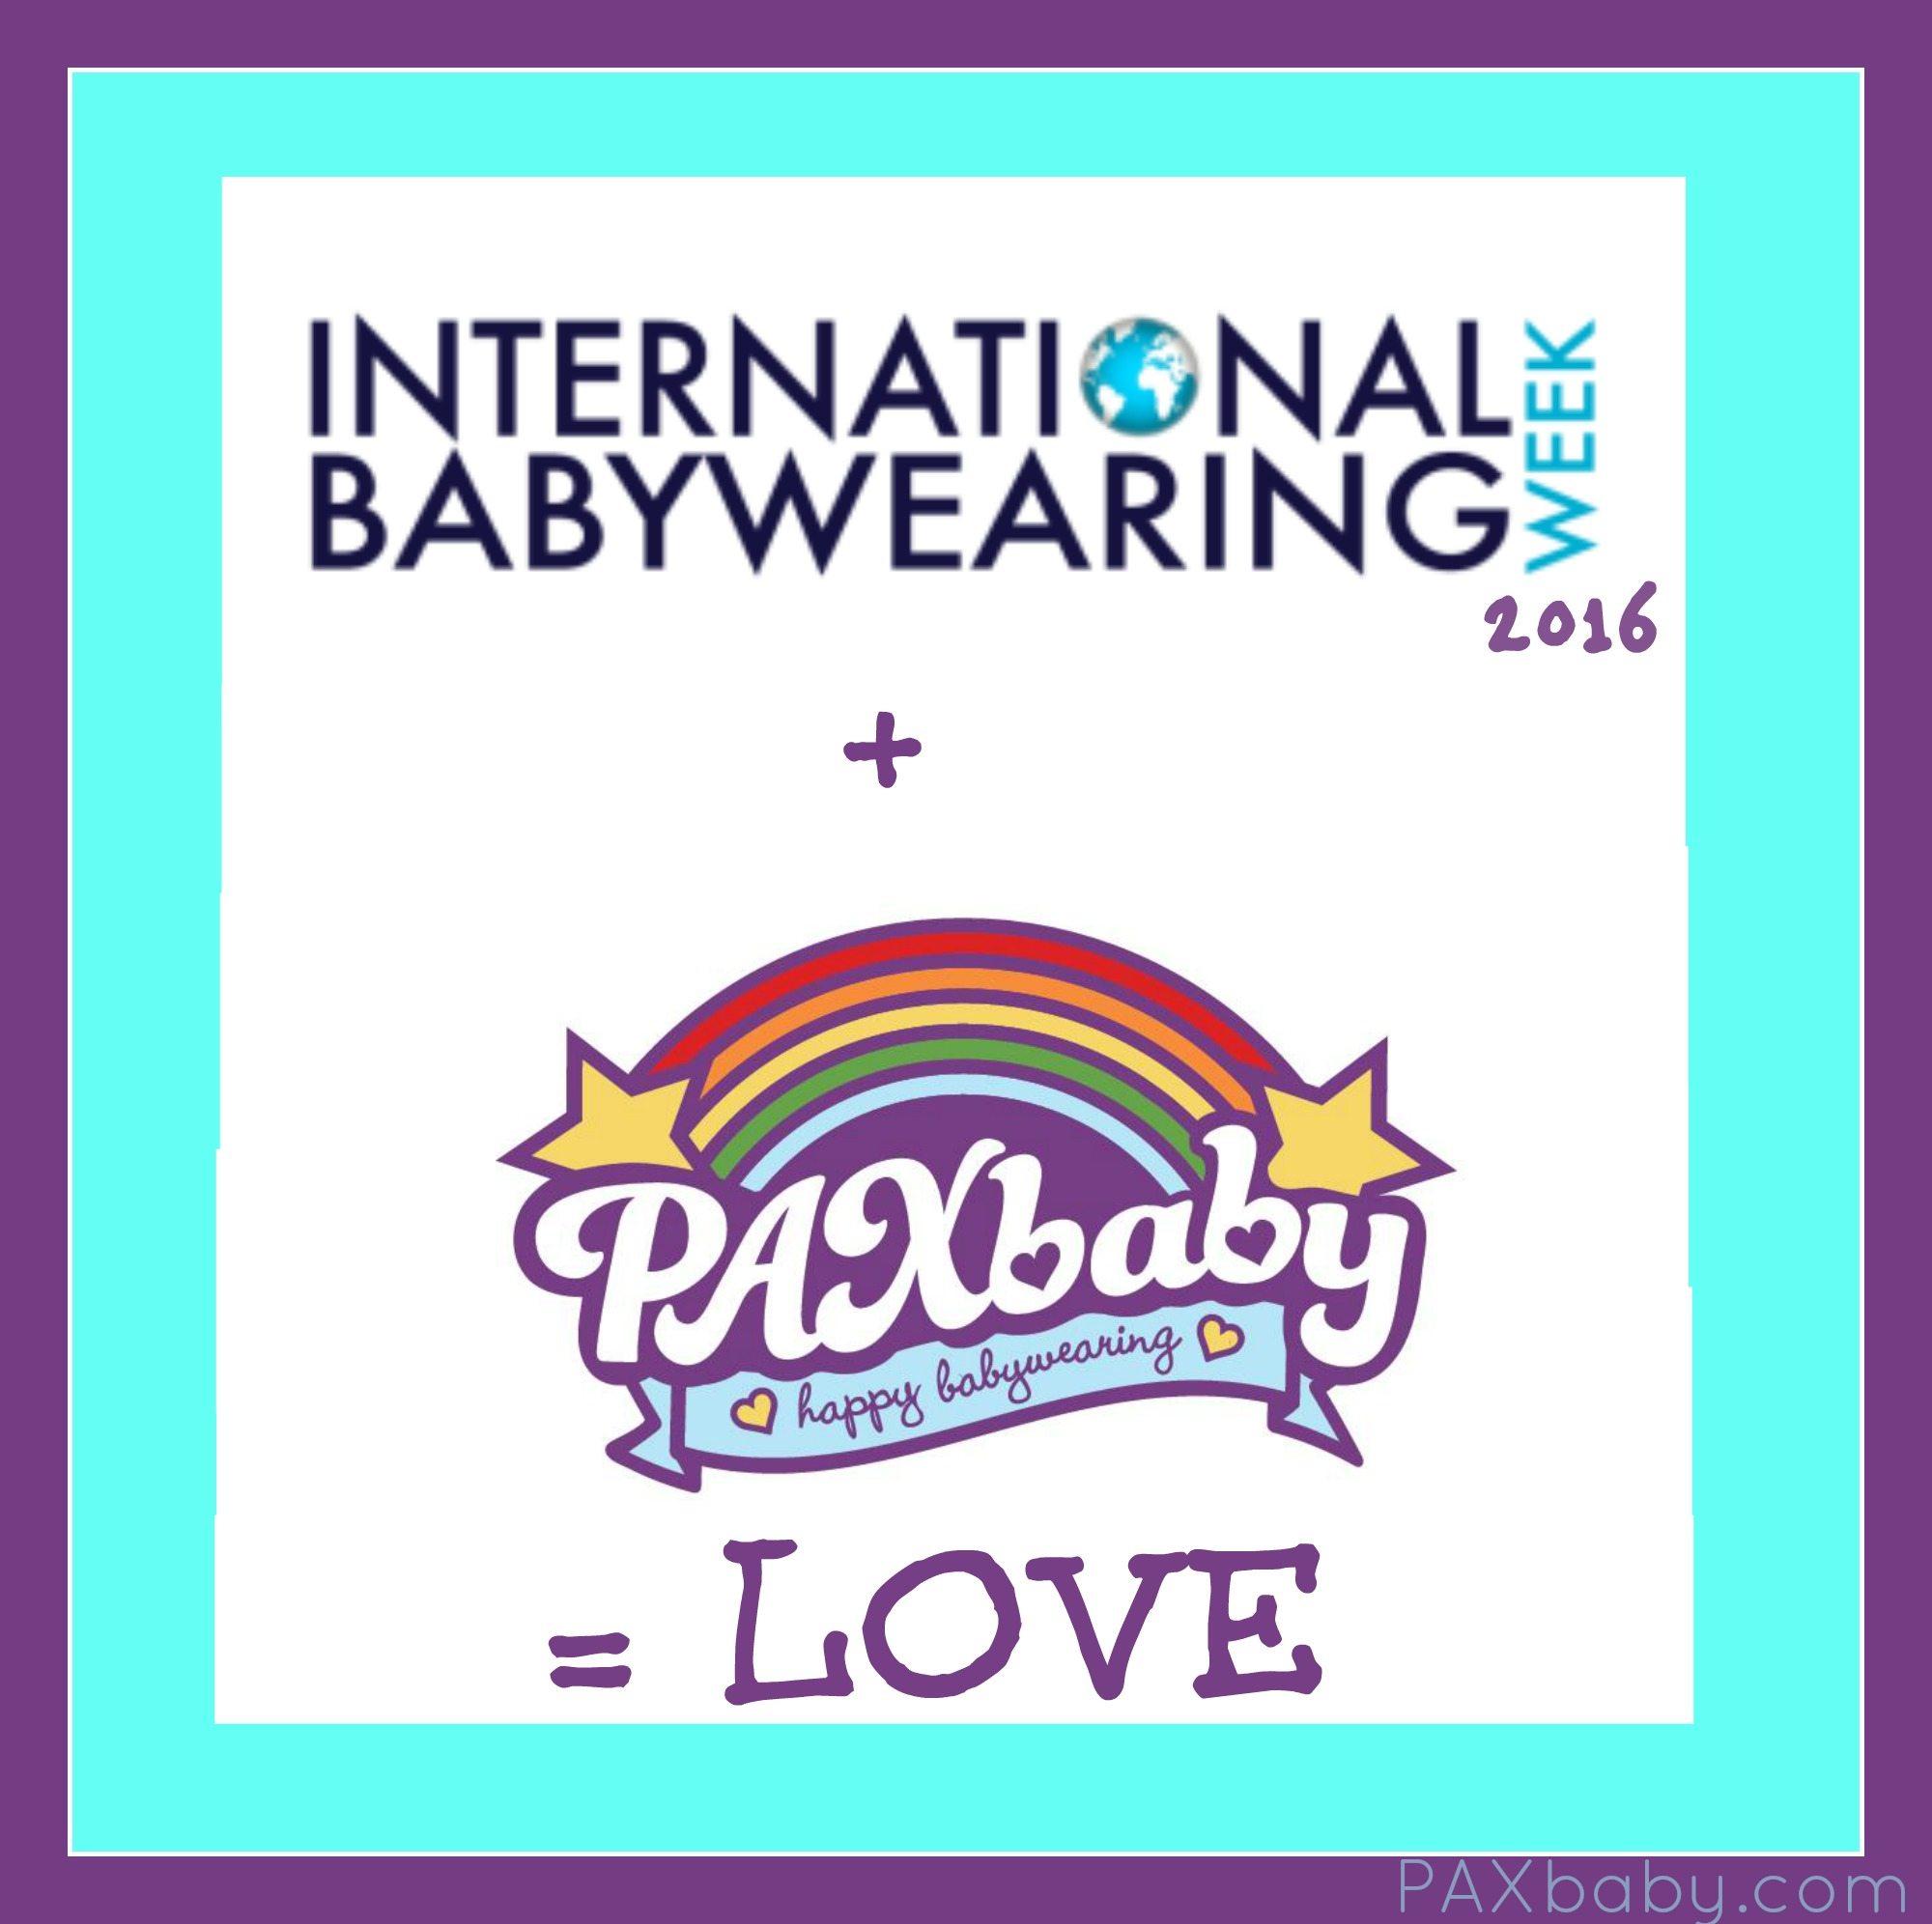 paxbaby_babywearing_international-babywearing-week-2016_pax_spread-the-love